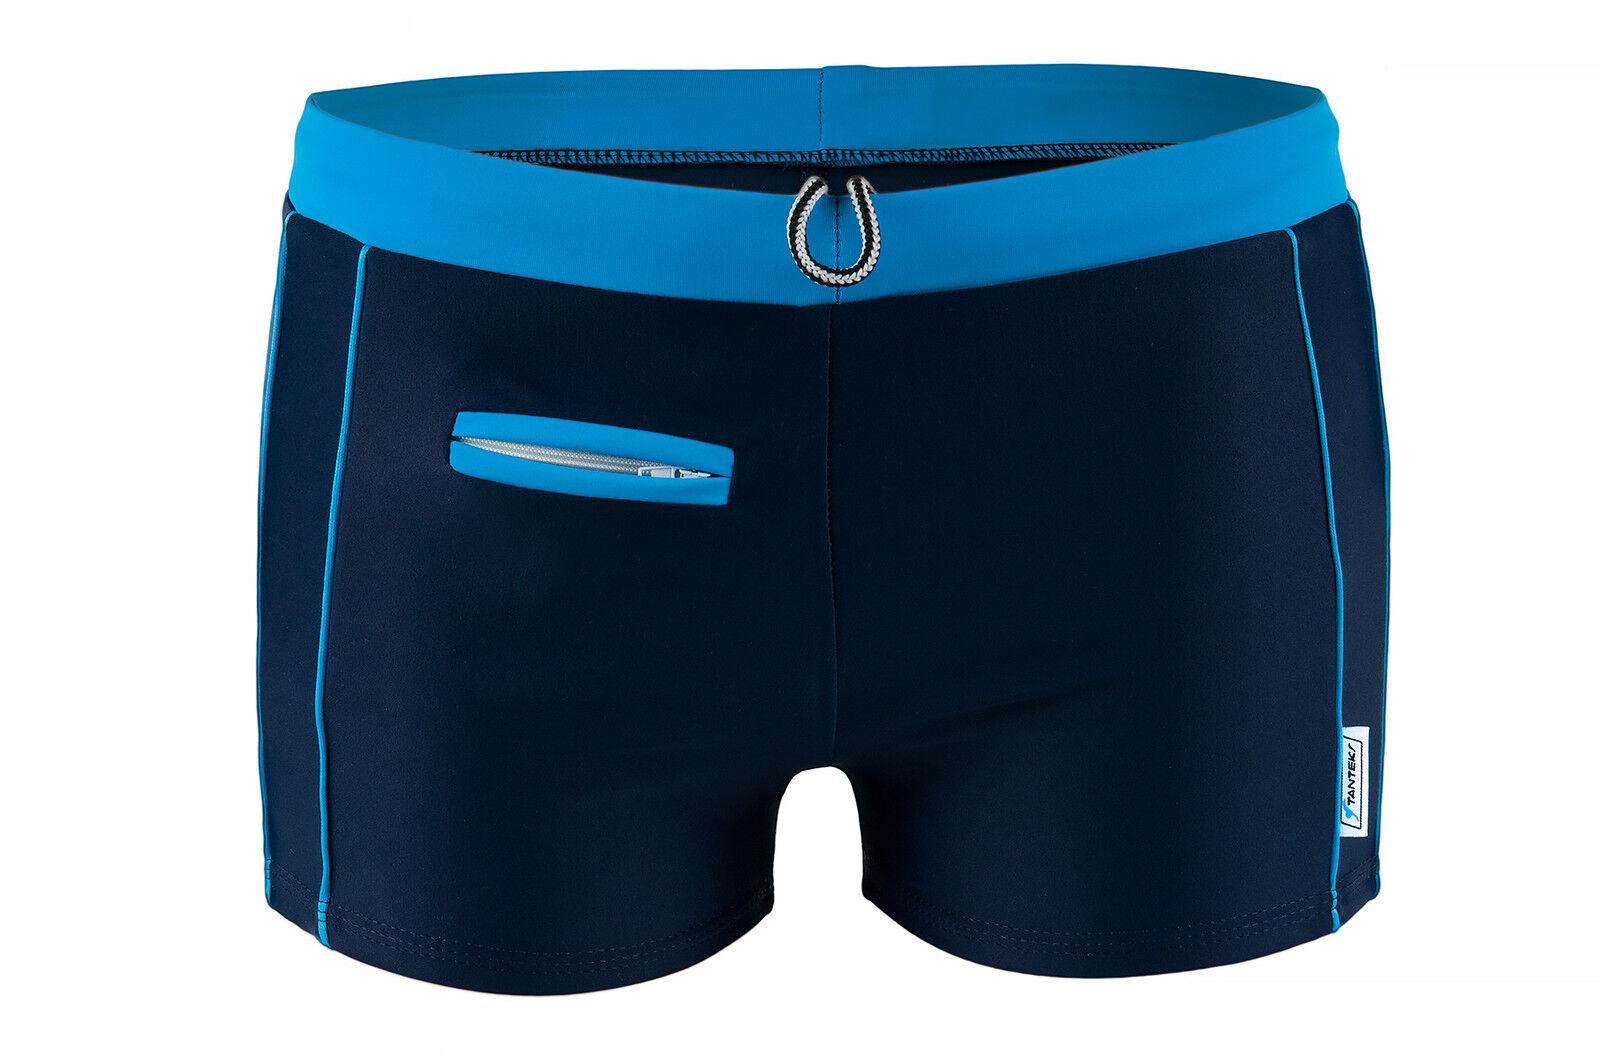 New Mens Lycra Swim Swimming Trunks Professional Swimwear Shorts